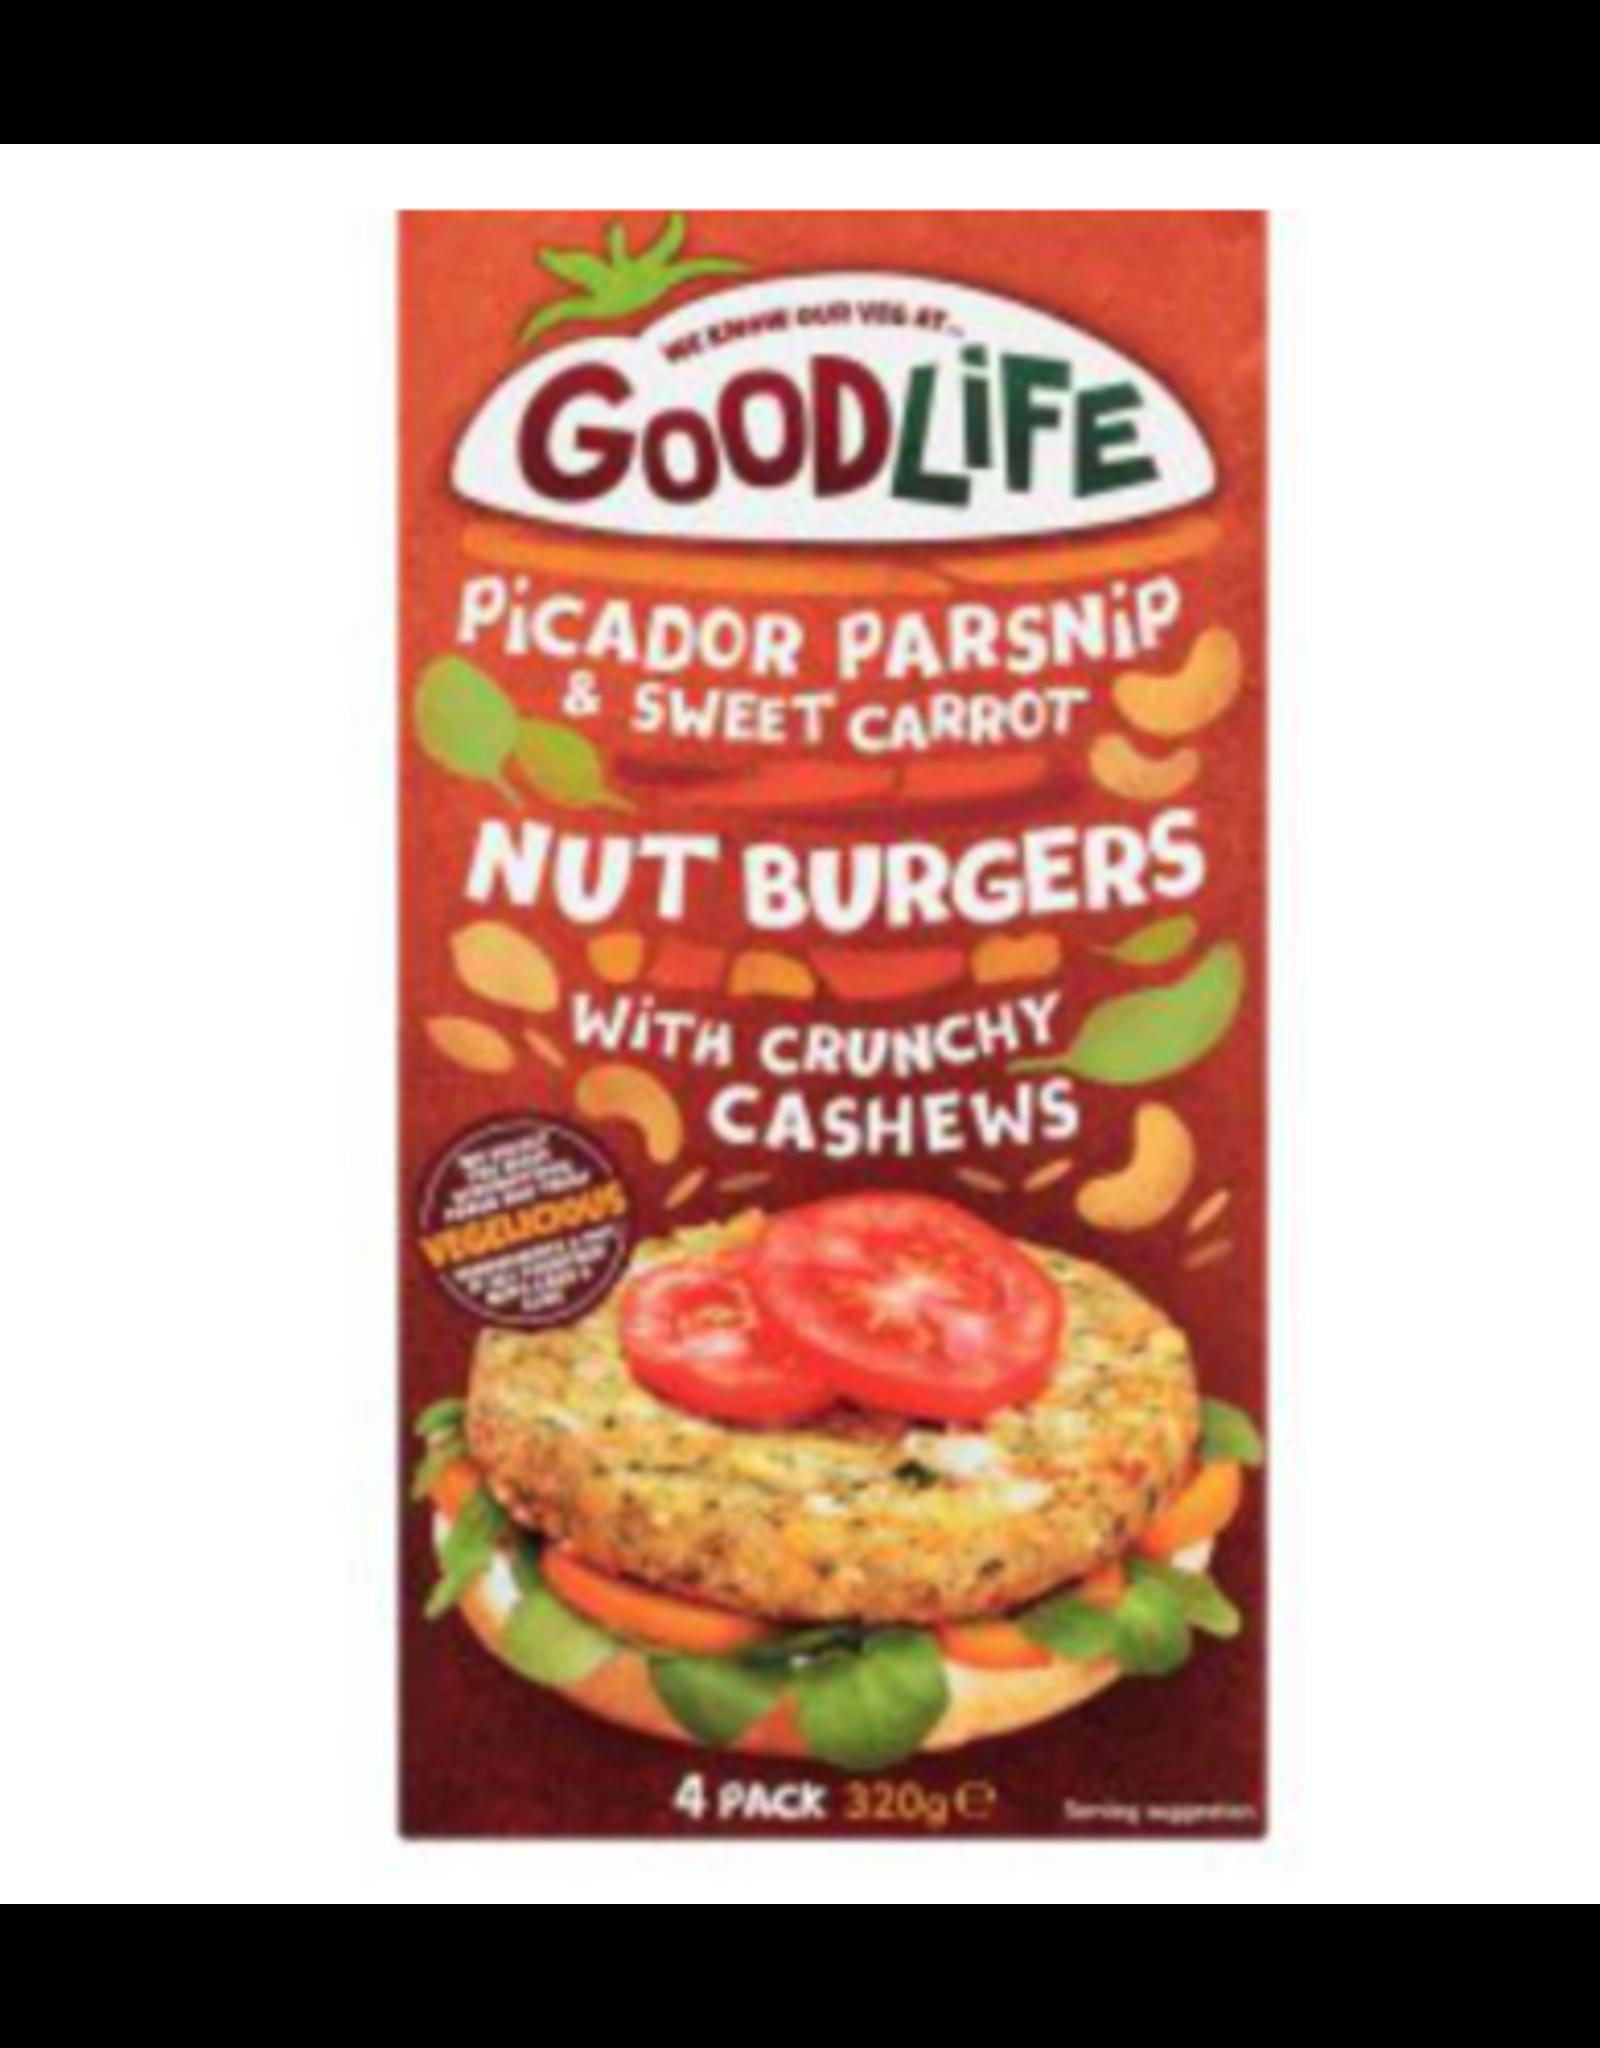 Goodlife Cashew-Burger, 320g ❄️❄️❄️